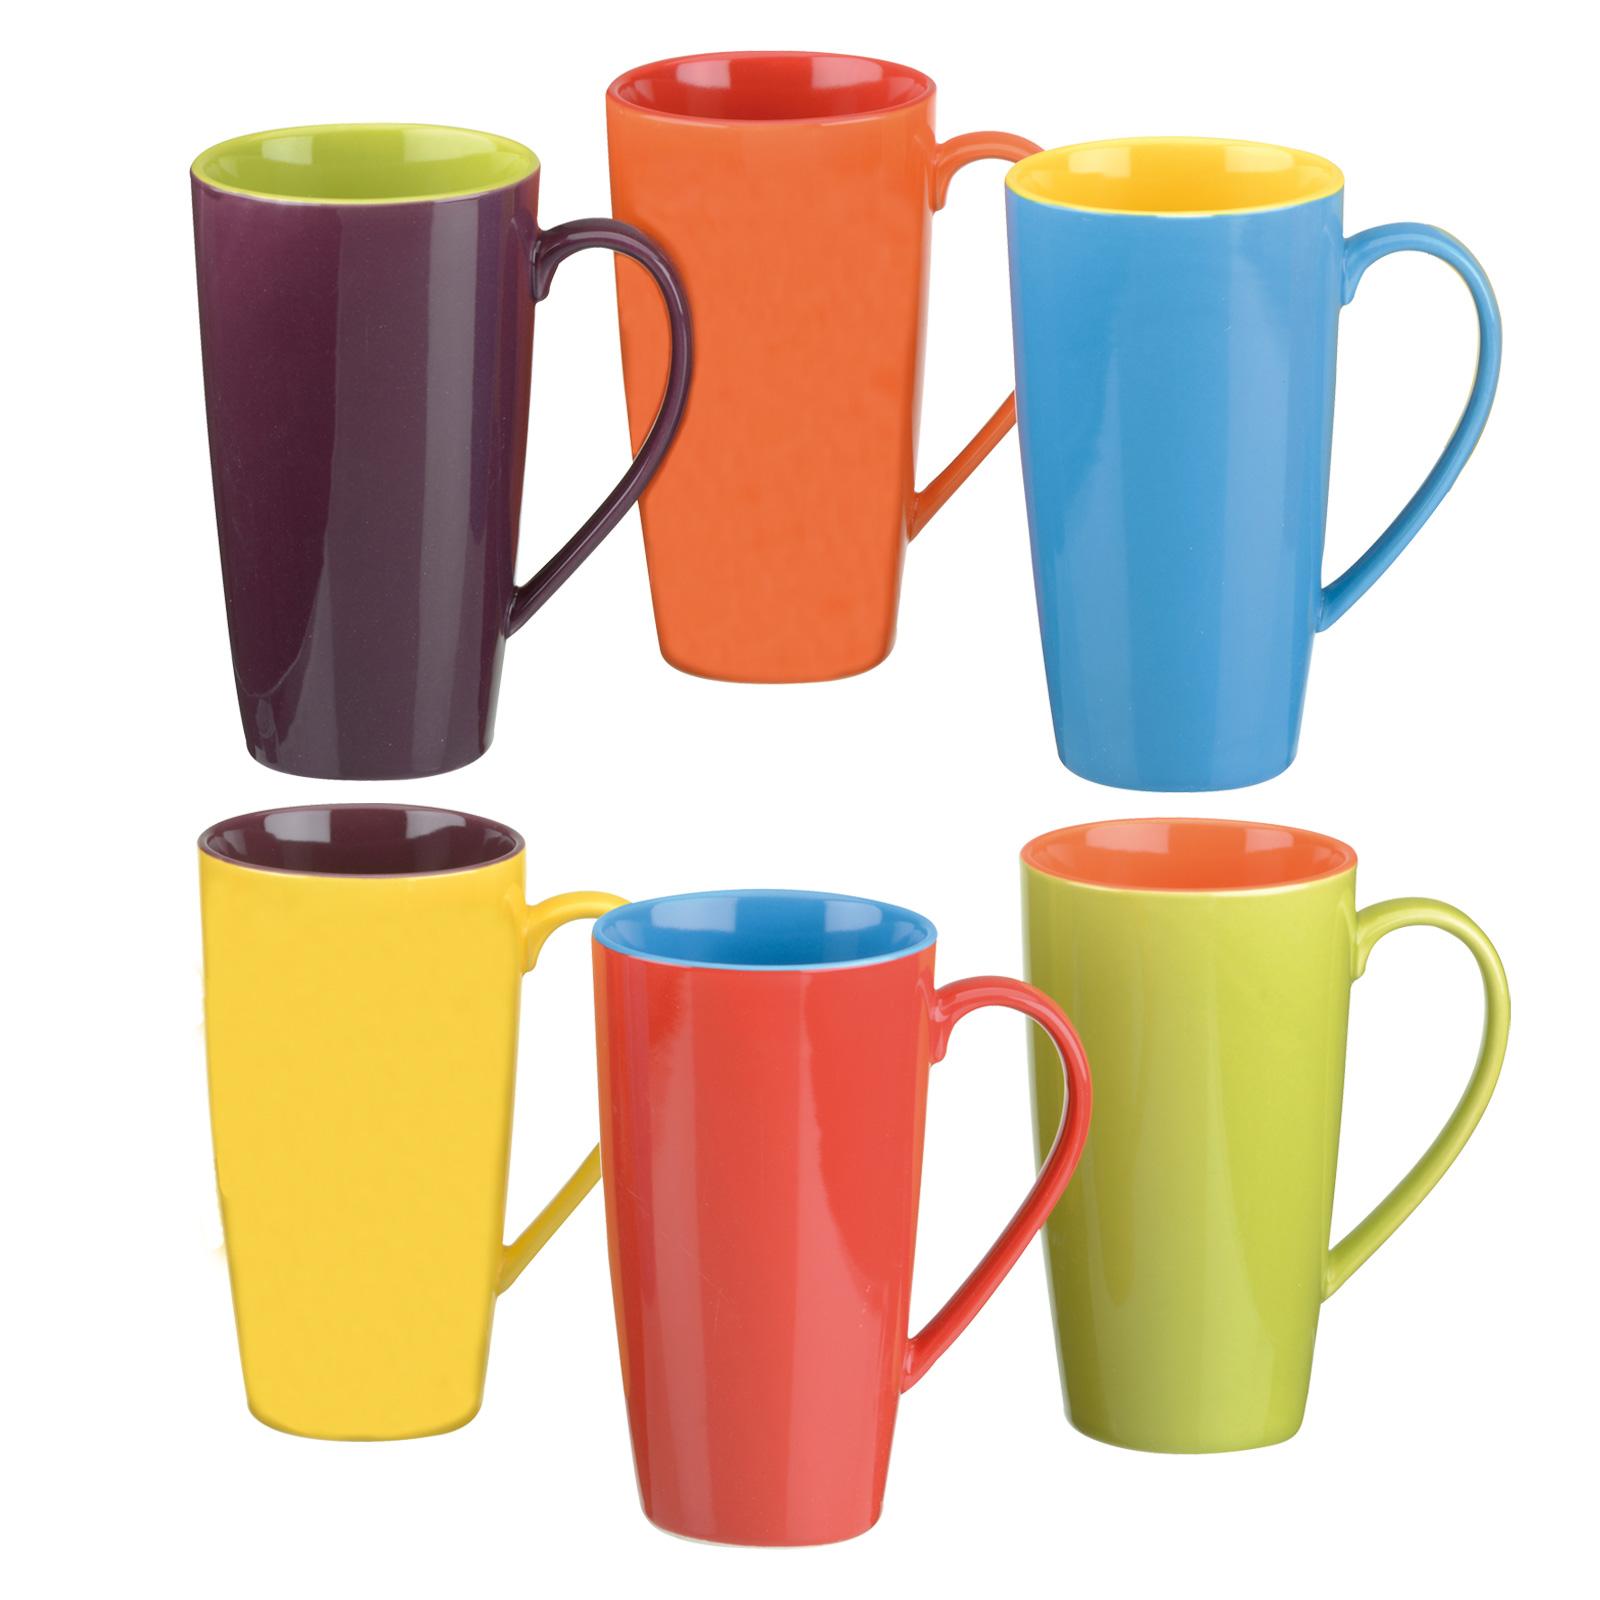 Set of 6 Harlequin Latte Mugs by BIA